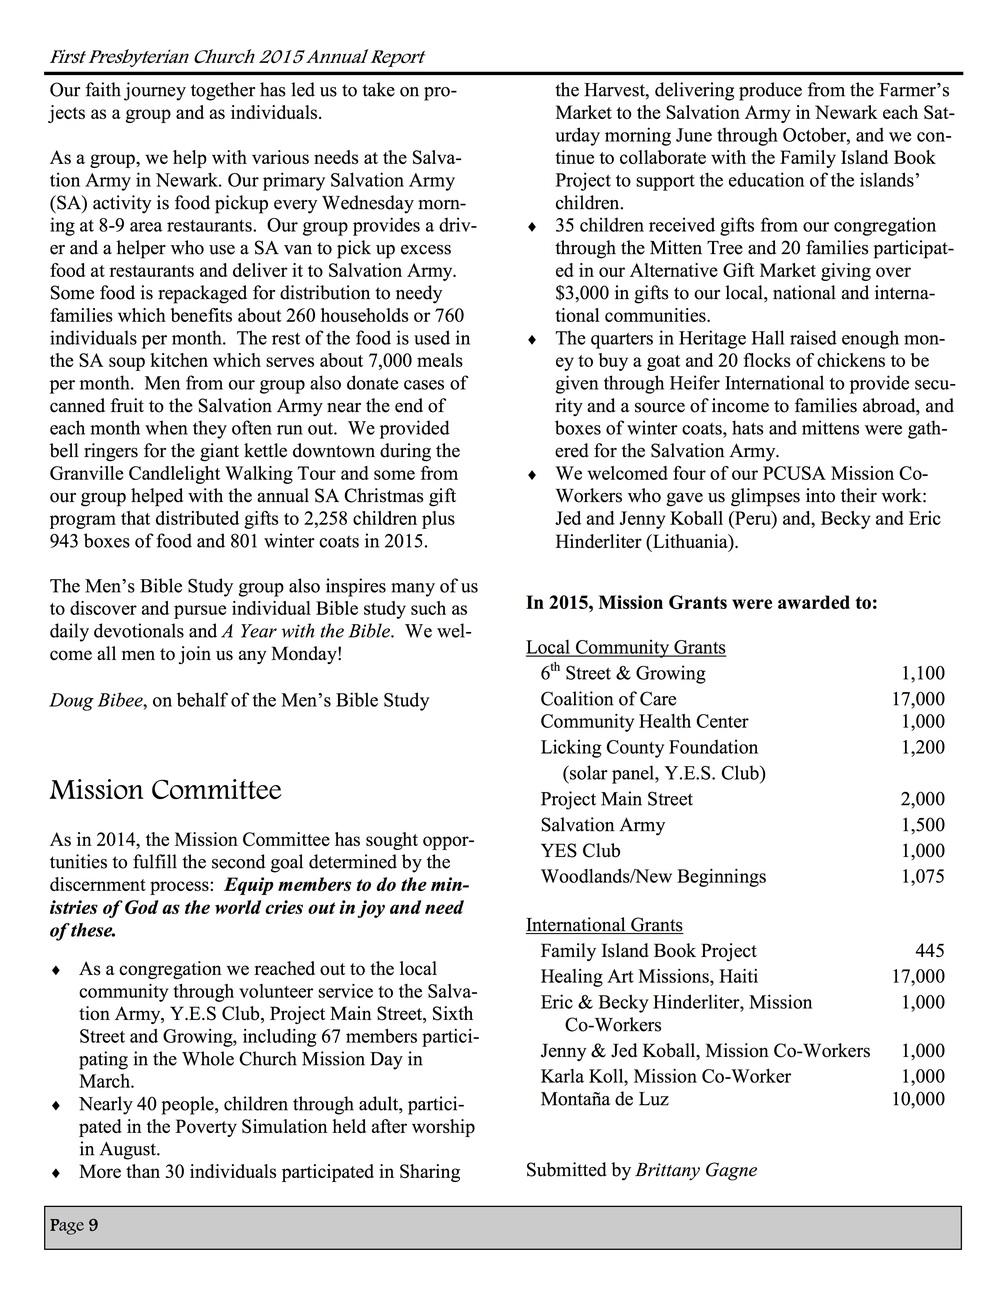 2015 Annual Report - 9.jpg